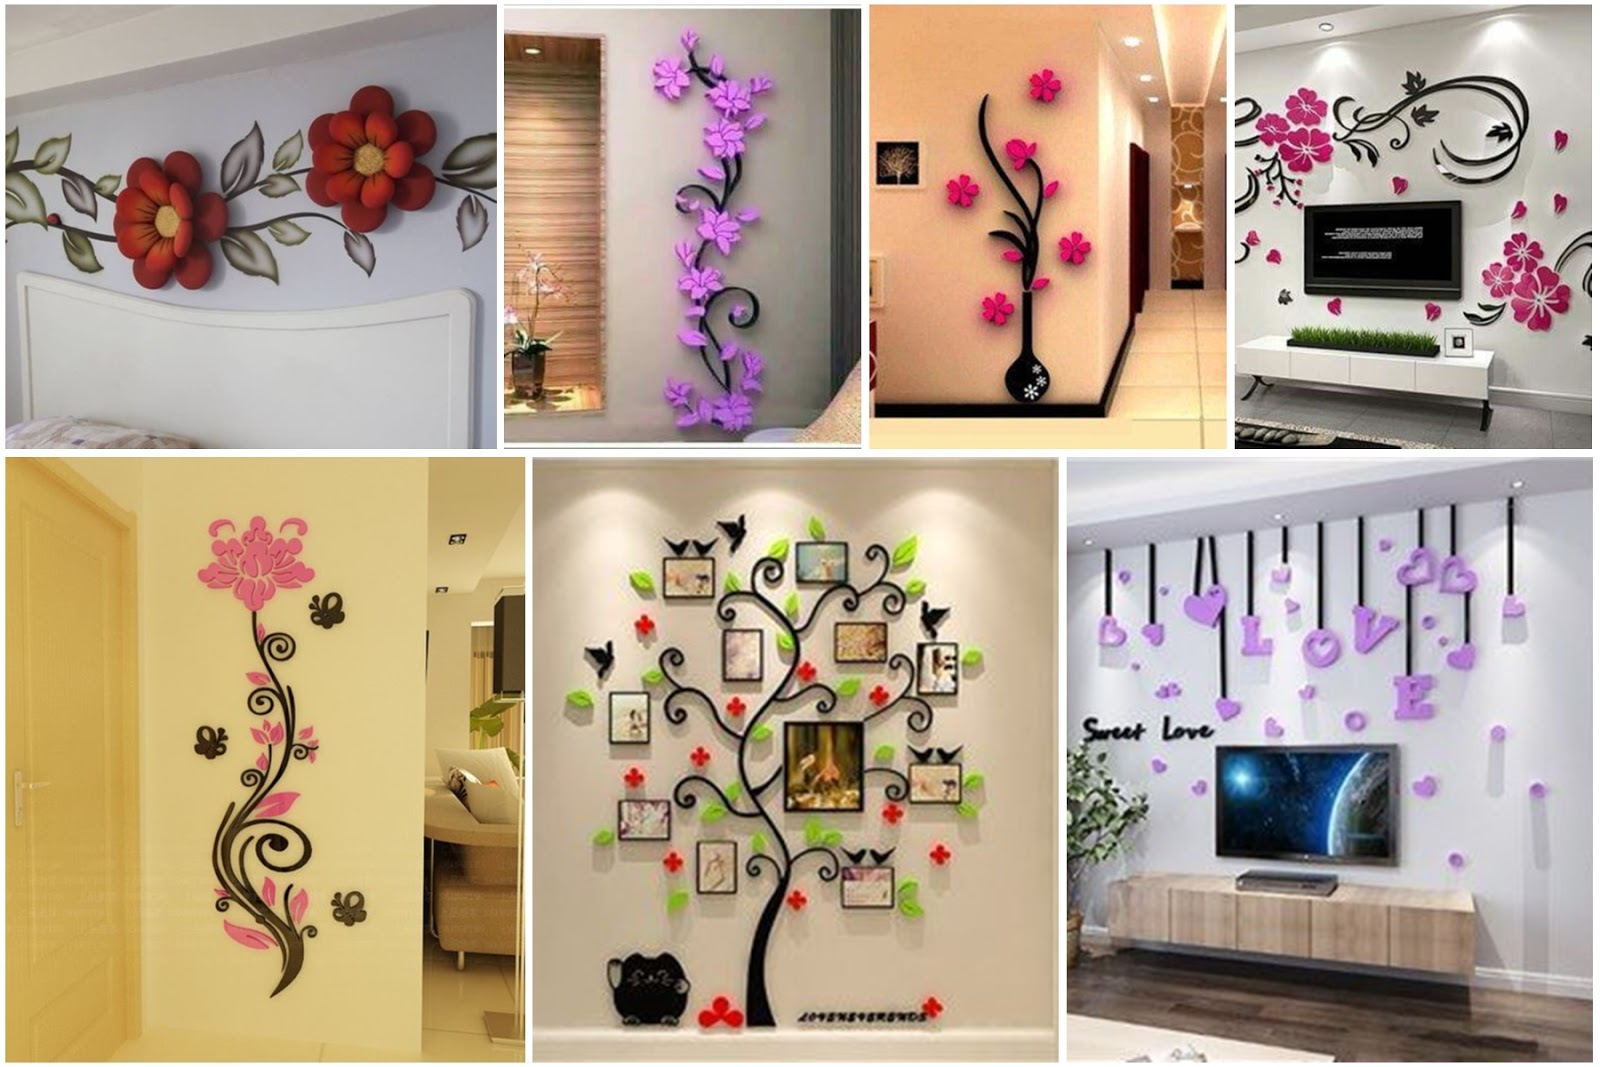 15 Room Wall Decoration Design Ideas That Captures Hearts Best Interior Design Ideas